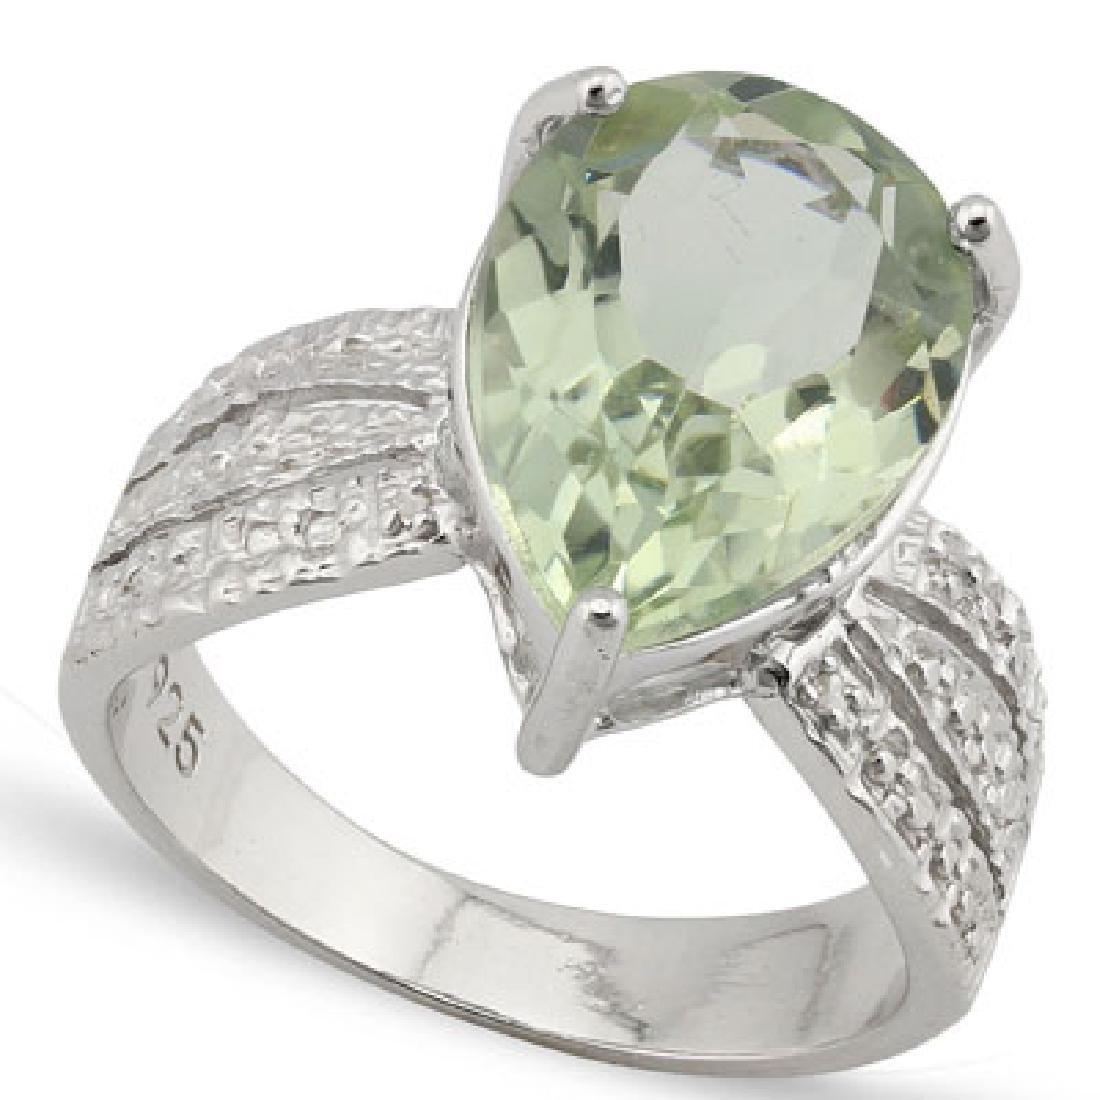 4.533 CARAT TW GREEN AMETHYST & GENUINE DIAMOND PLATINU